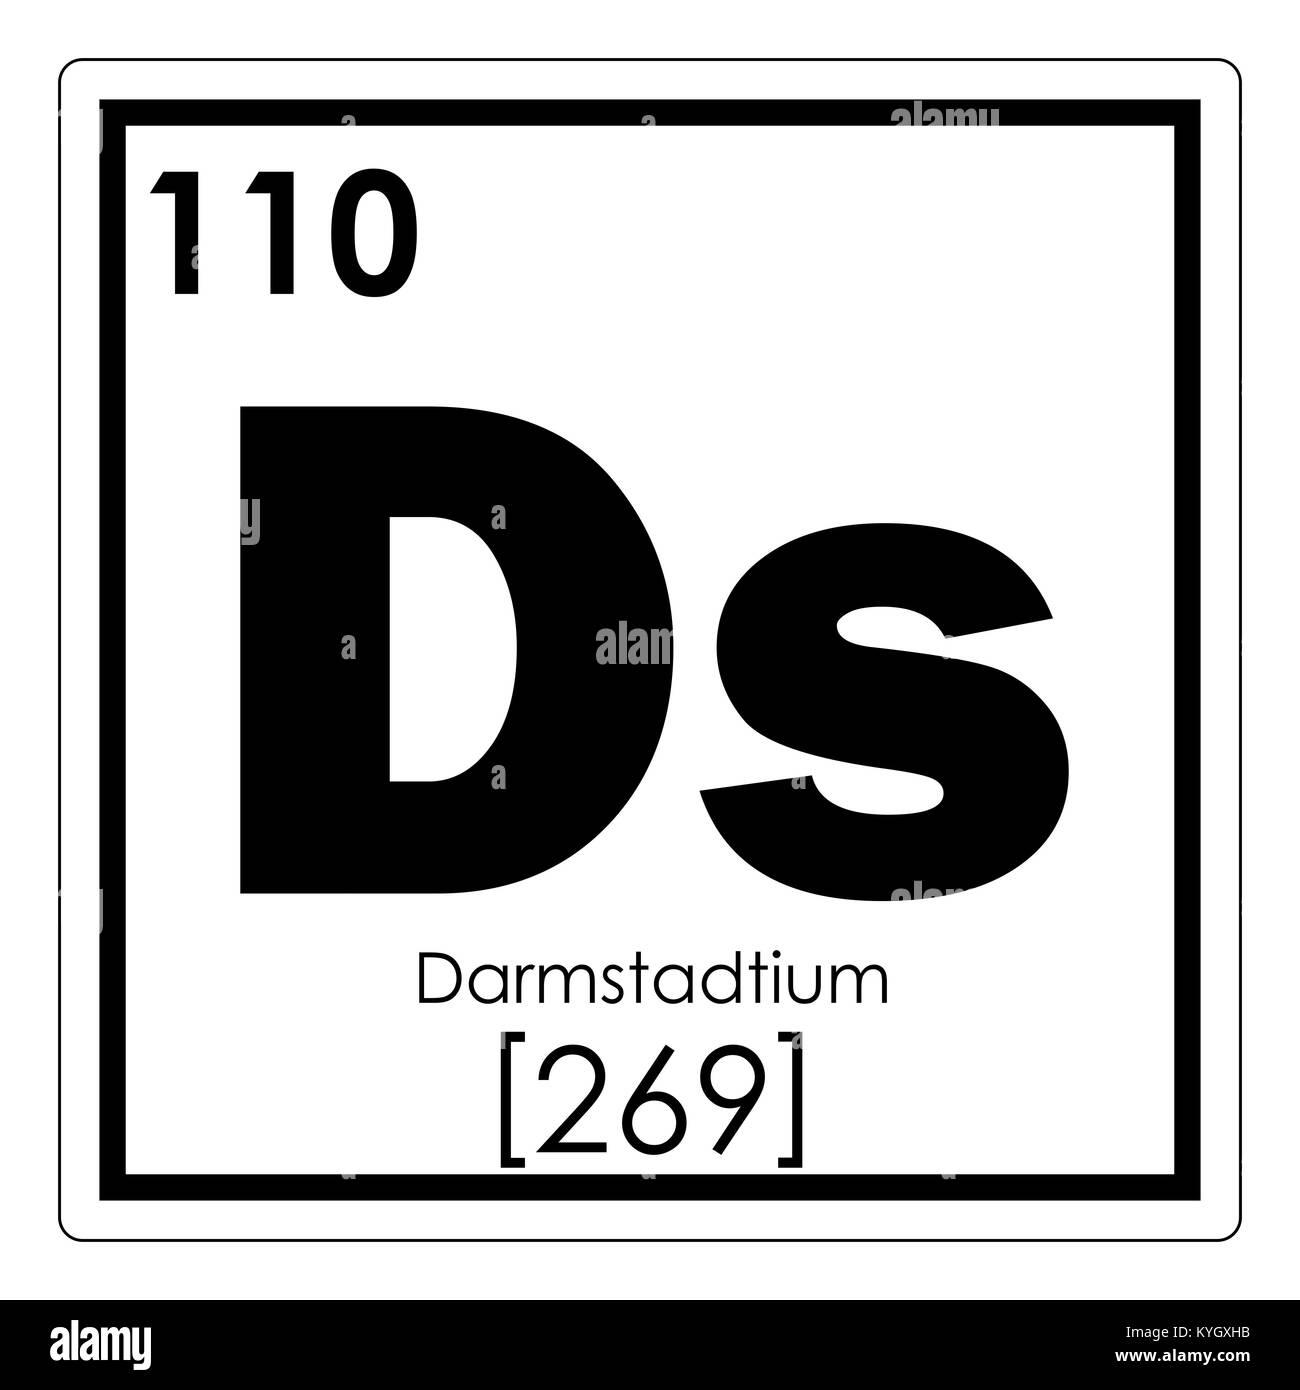 Neon symbol periodic table choice image symbol and sign ideas atom symbol stock photos atom symbol stock images alamy darmstadtium chemical element periodic table science symbol urtaz Choice Image